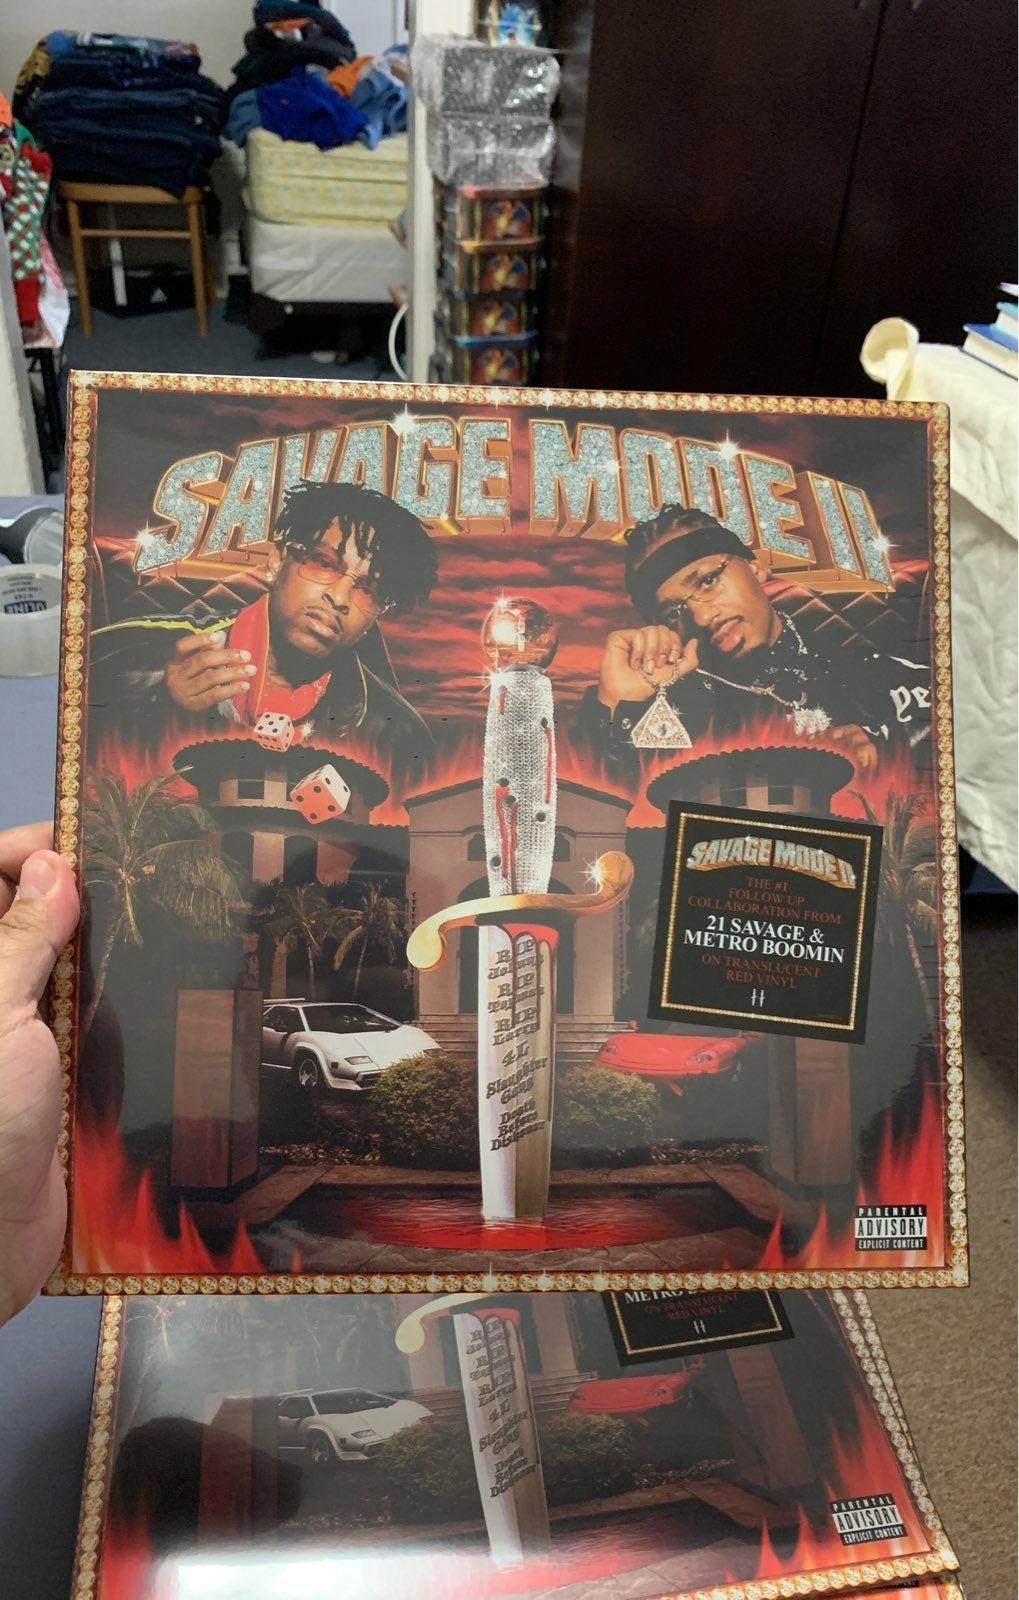 21 Savage Mode II Exclusive Red Vinyl